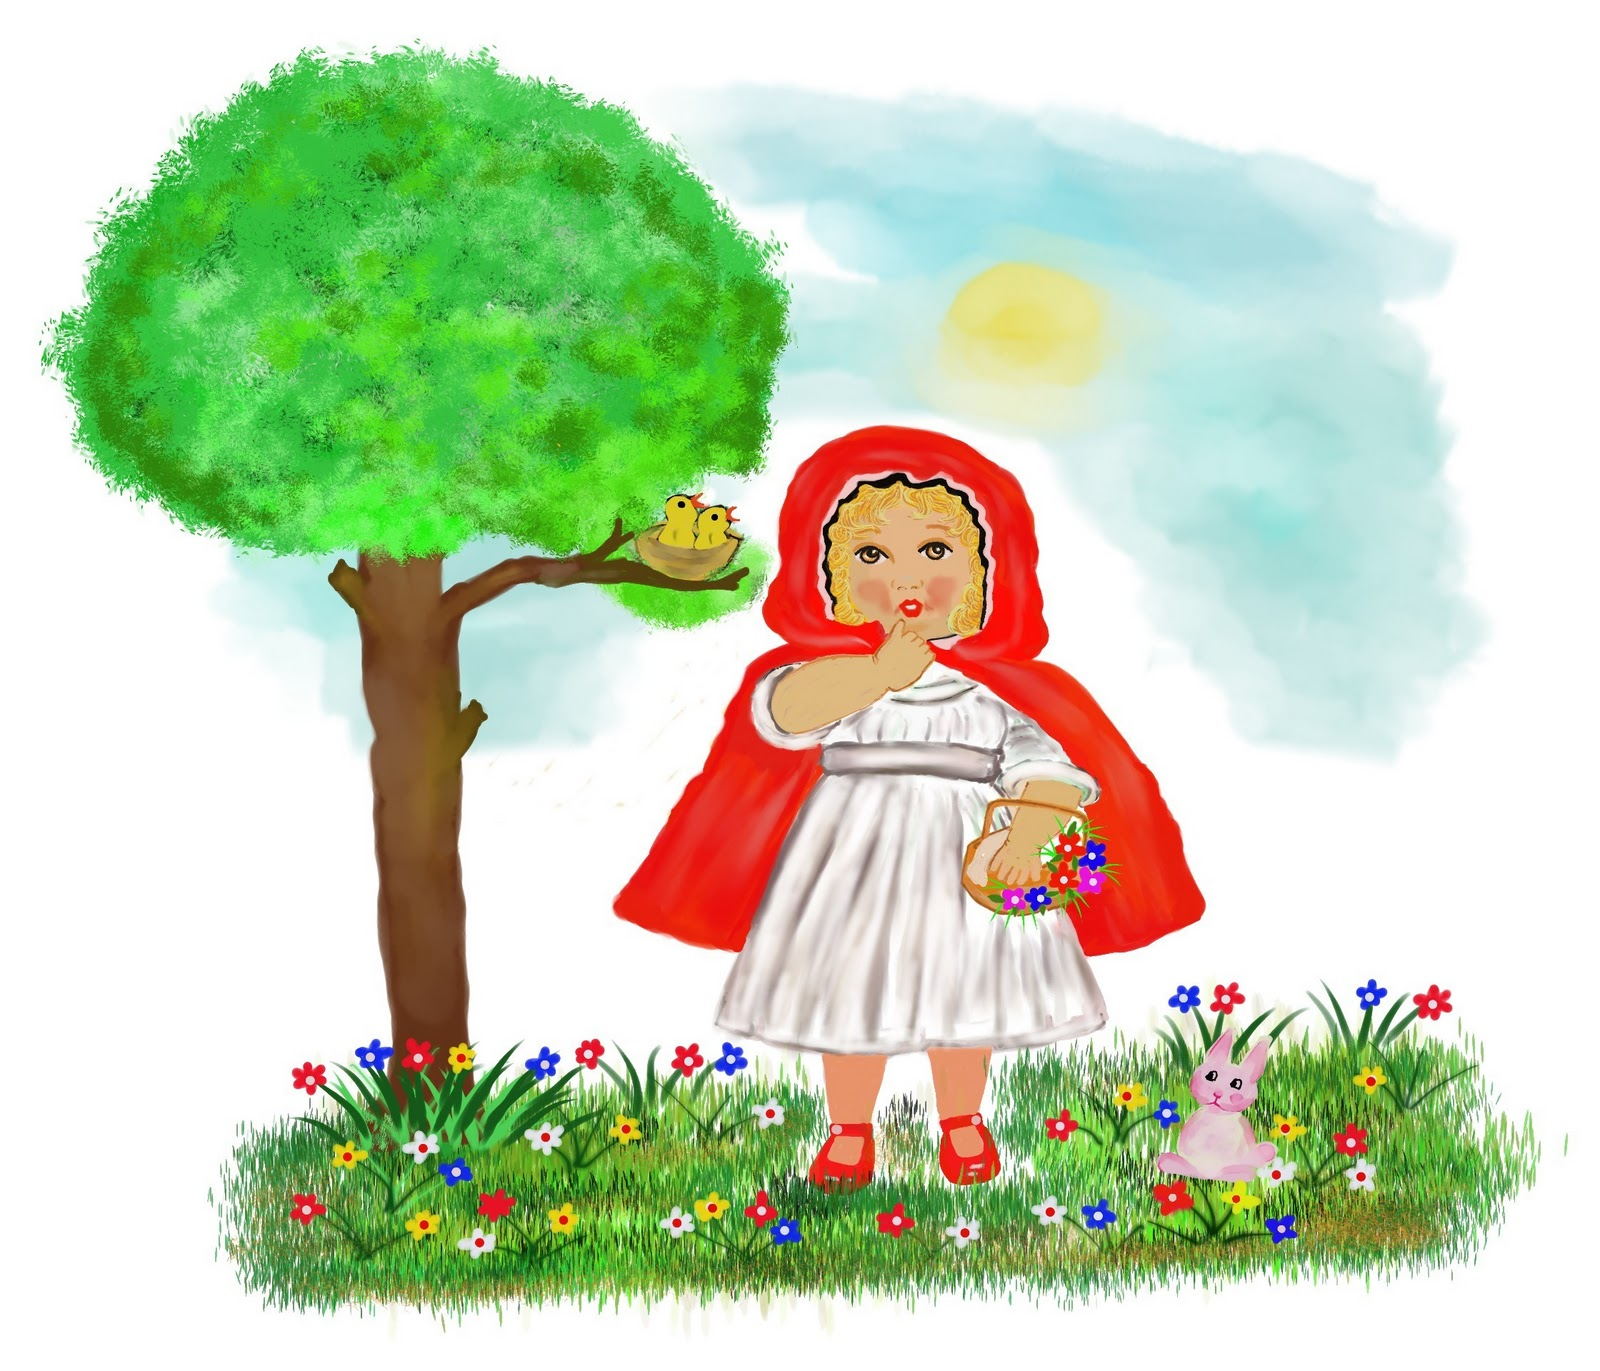 Arte susana ilustraciones infantiles - Ilustraciones infantiles antiguas ...